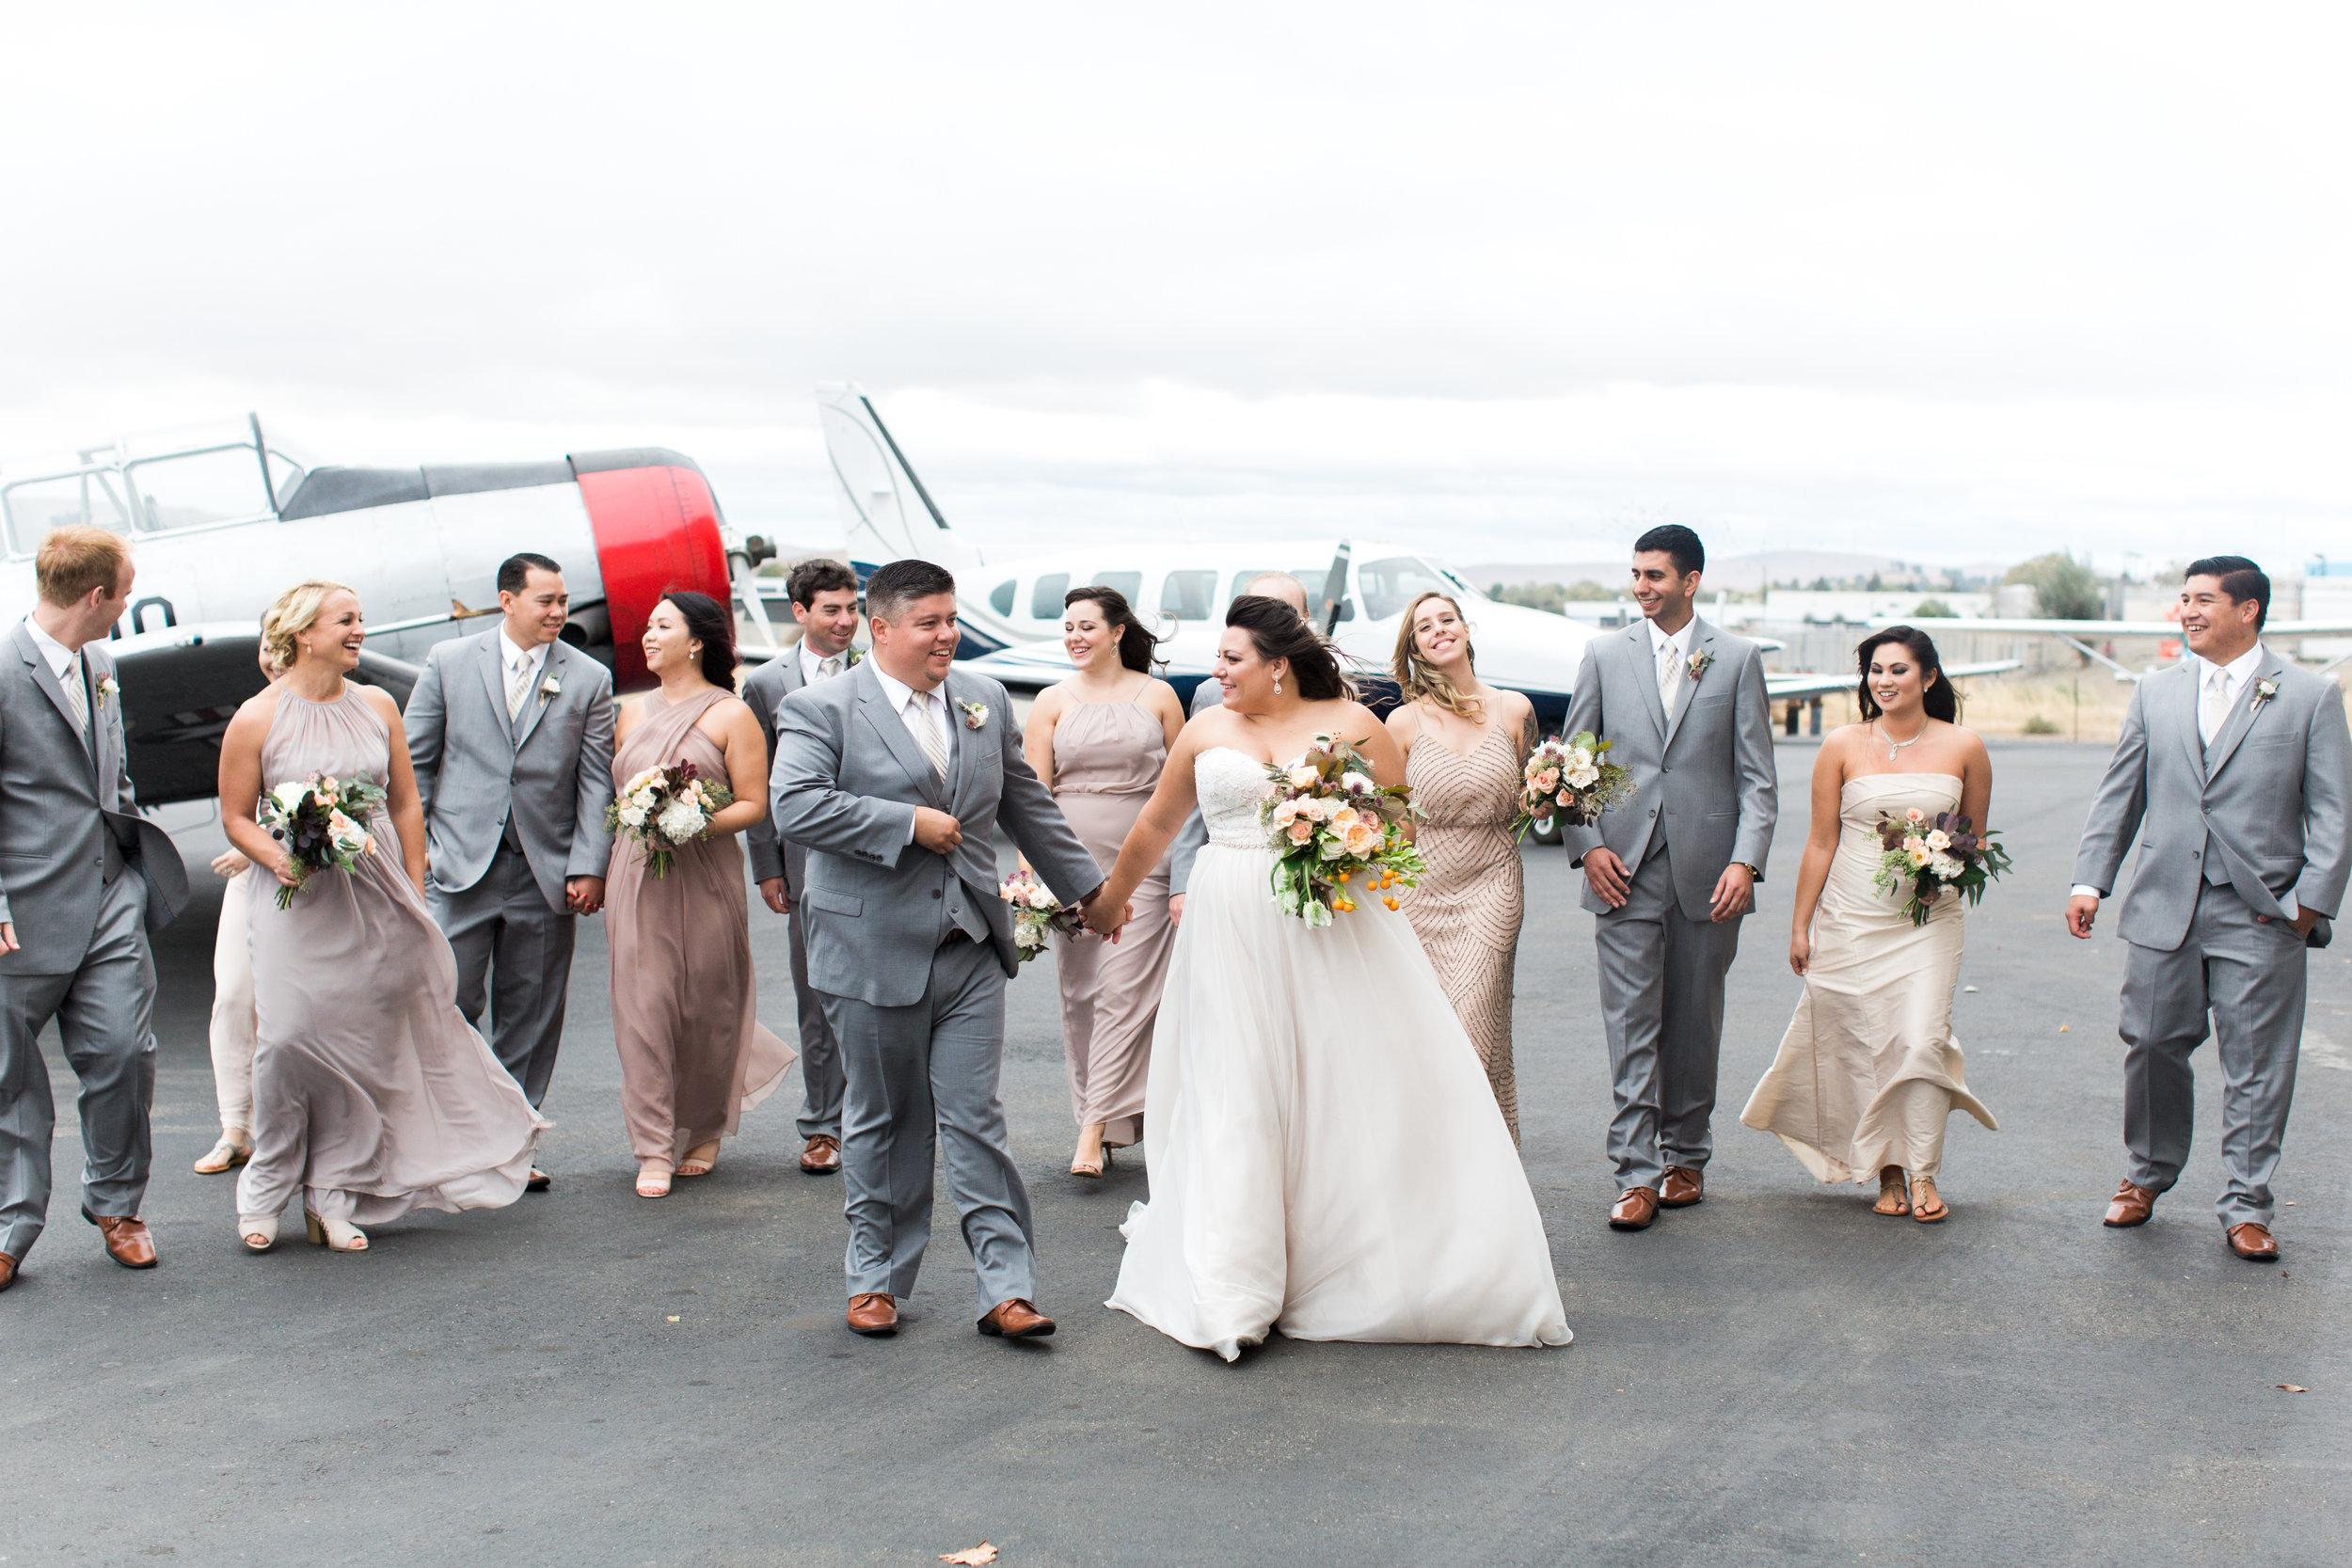 airport-hanger-wedding-at-attitude-aviation-in-livermore-73.jpg